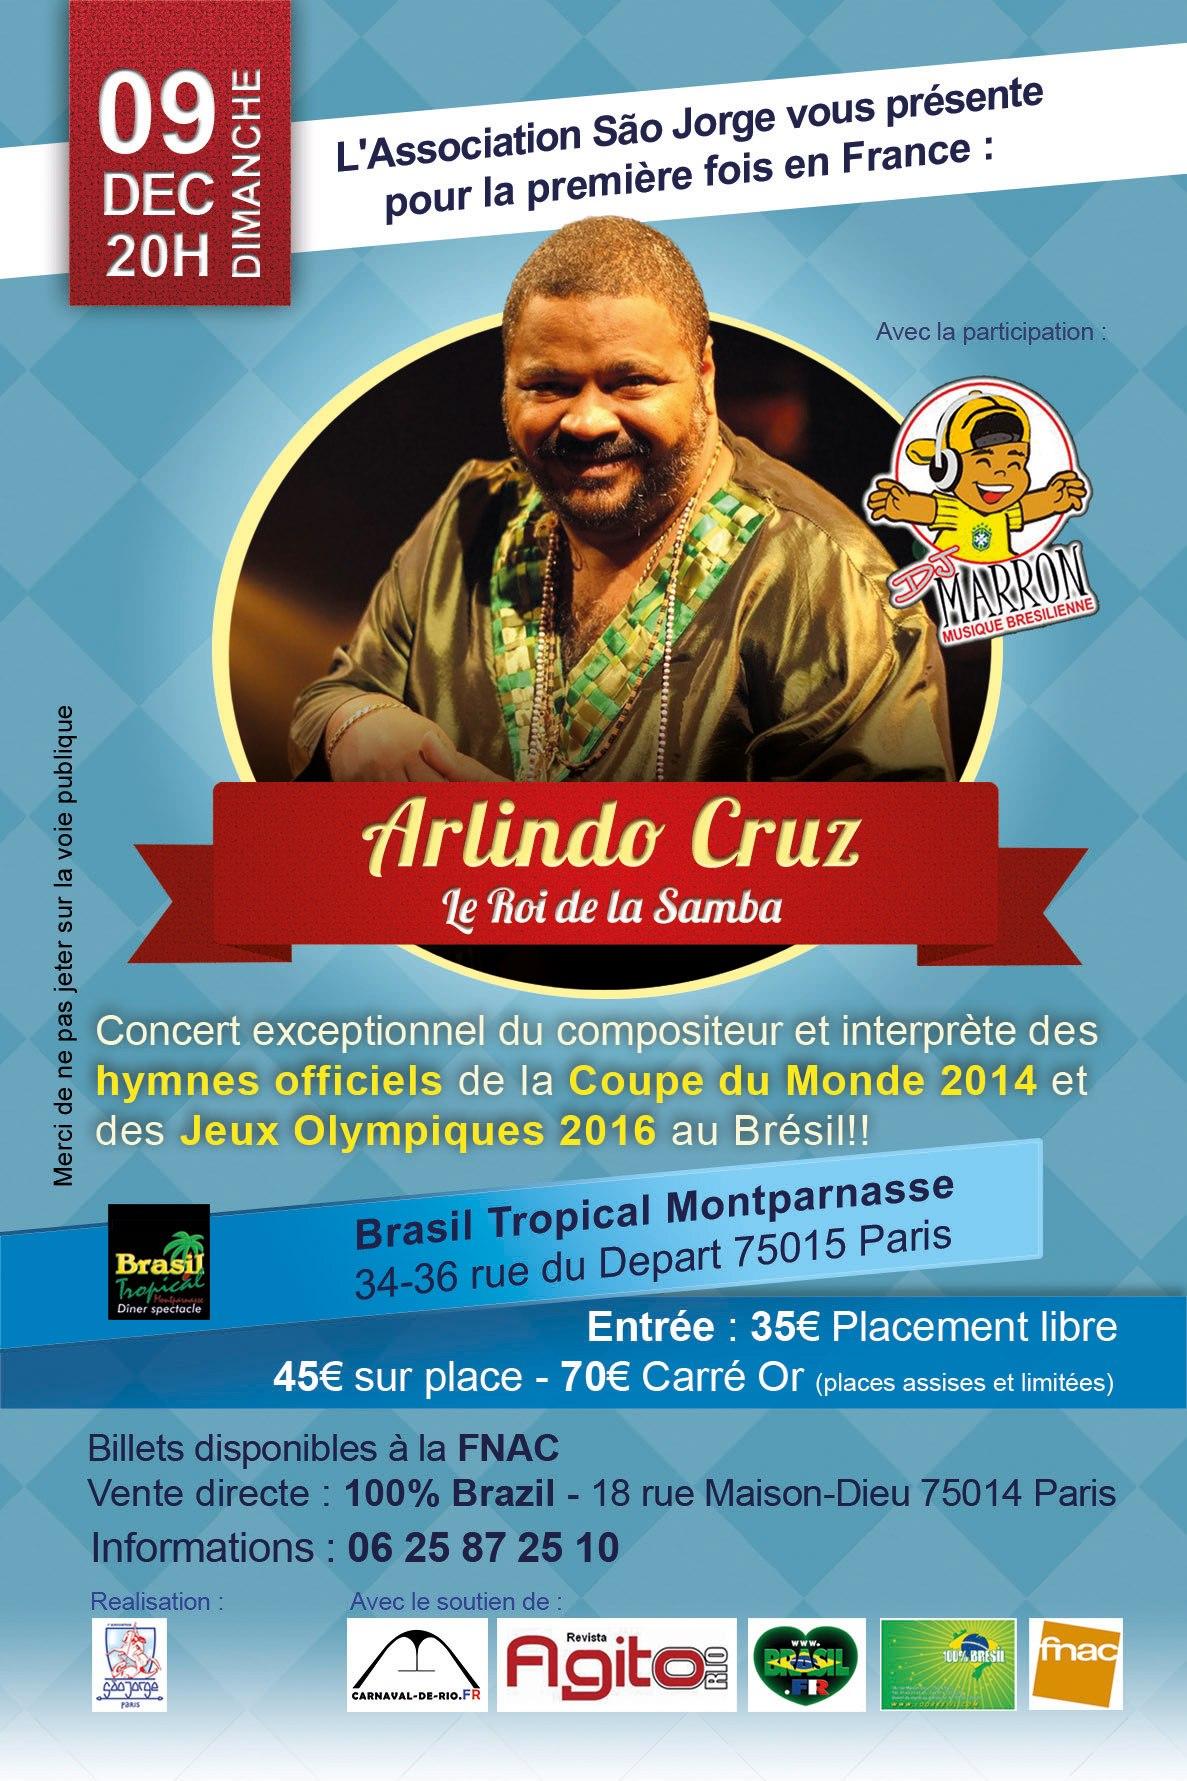 Image Result For Arlindo Cruz